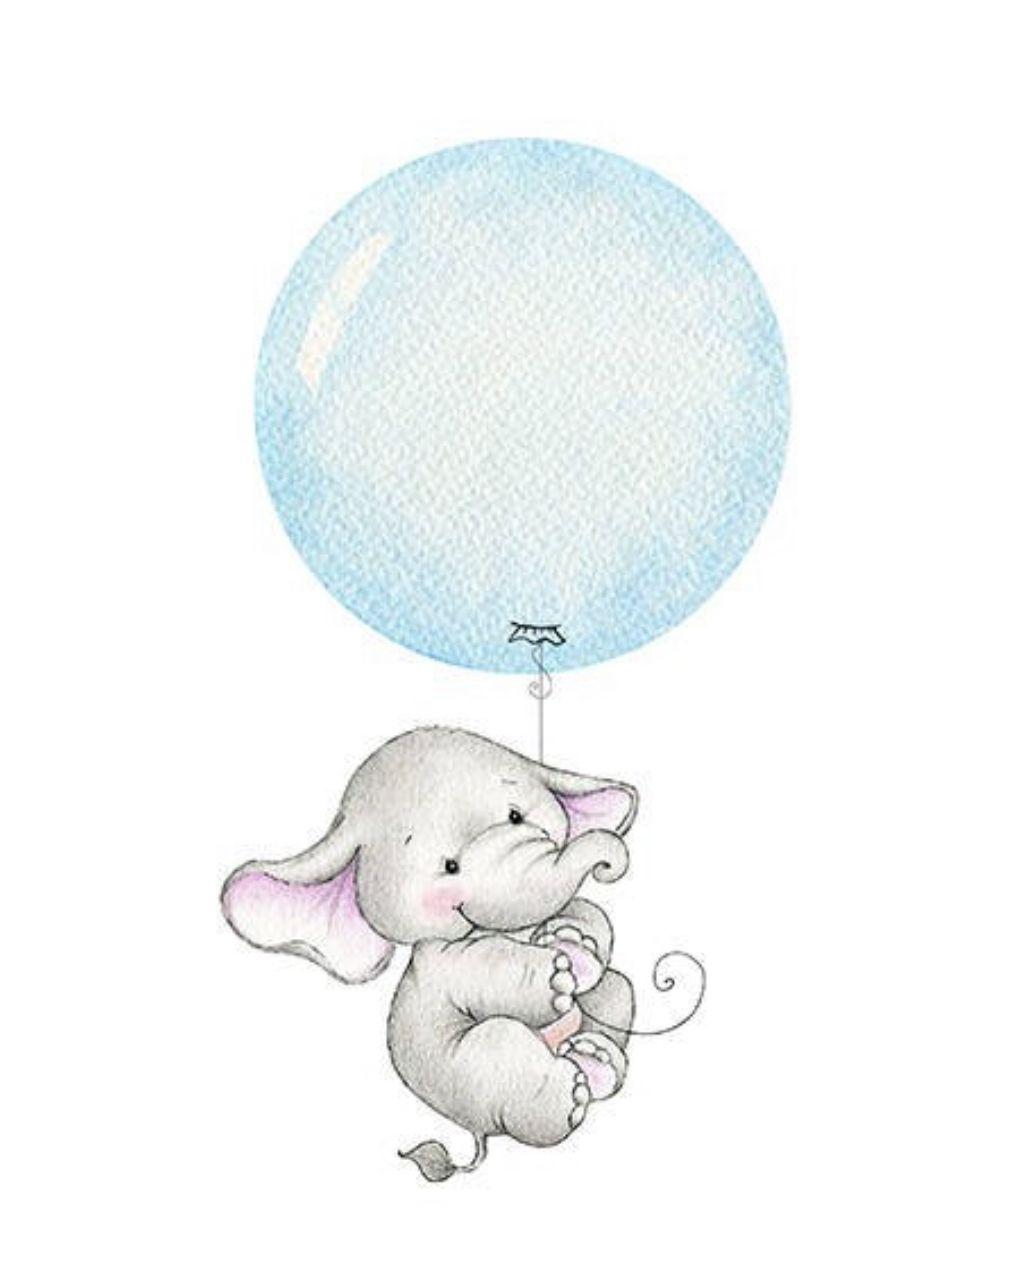 Balloon clipart baby elephant, Balloon baby elephant.